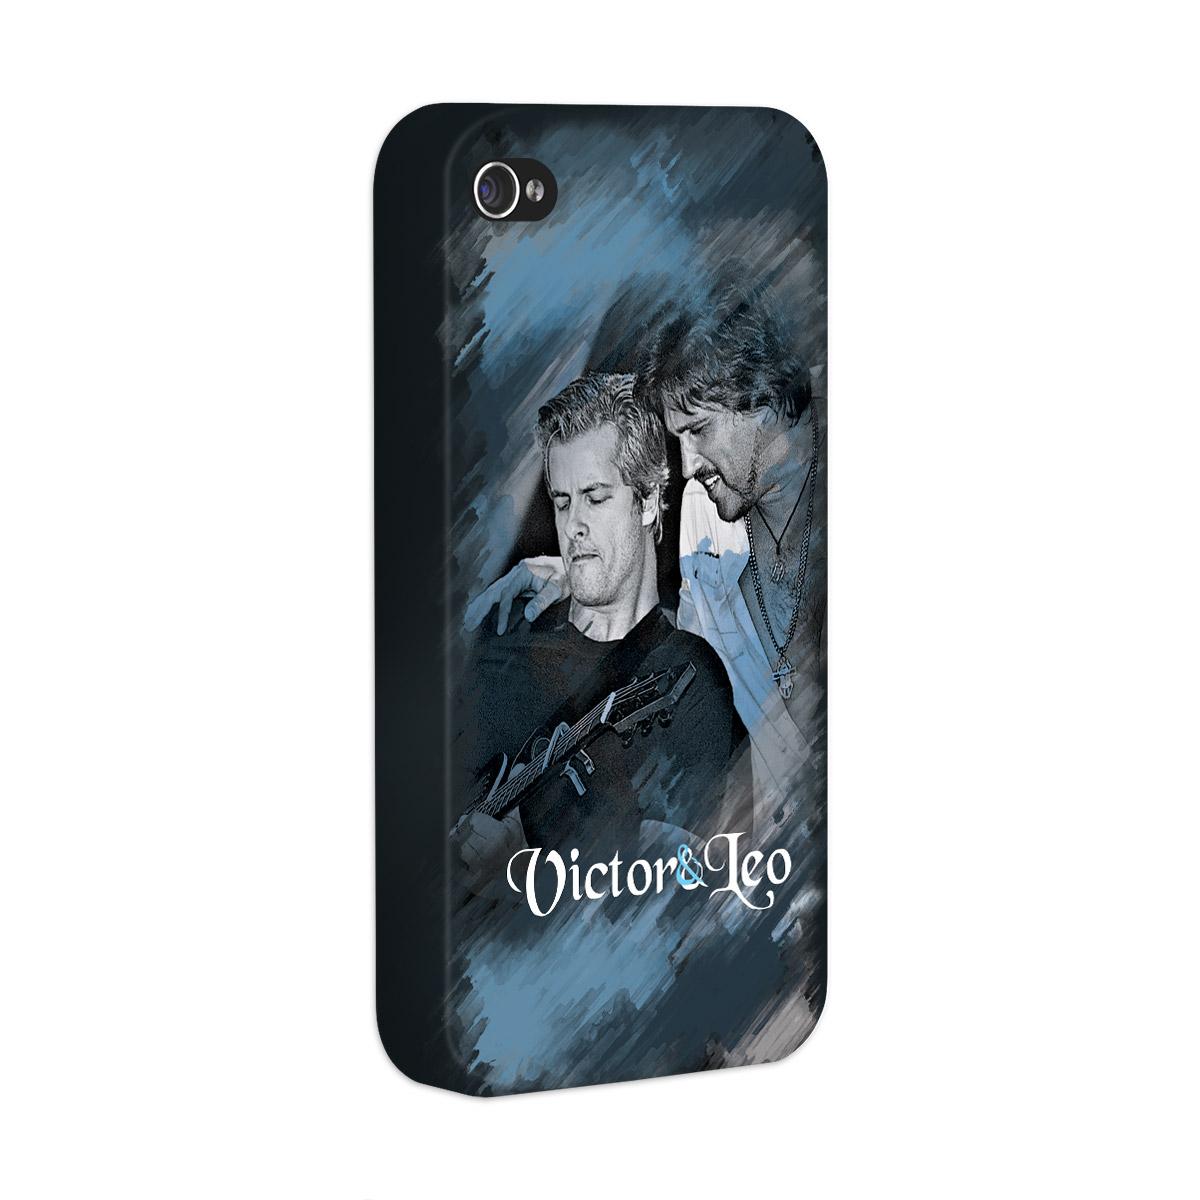 Capa para iPhone 4/4S Victor & Leo Perfil